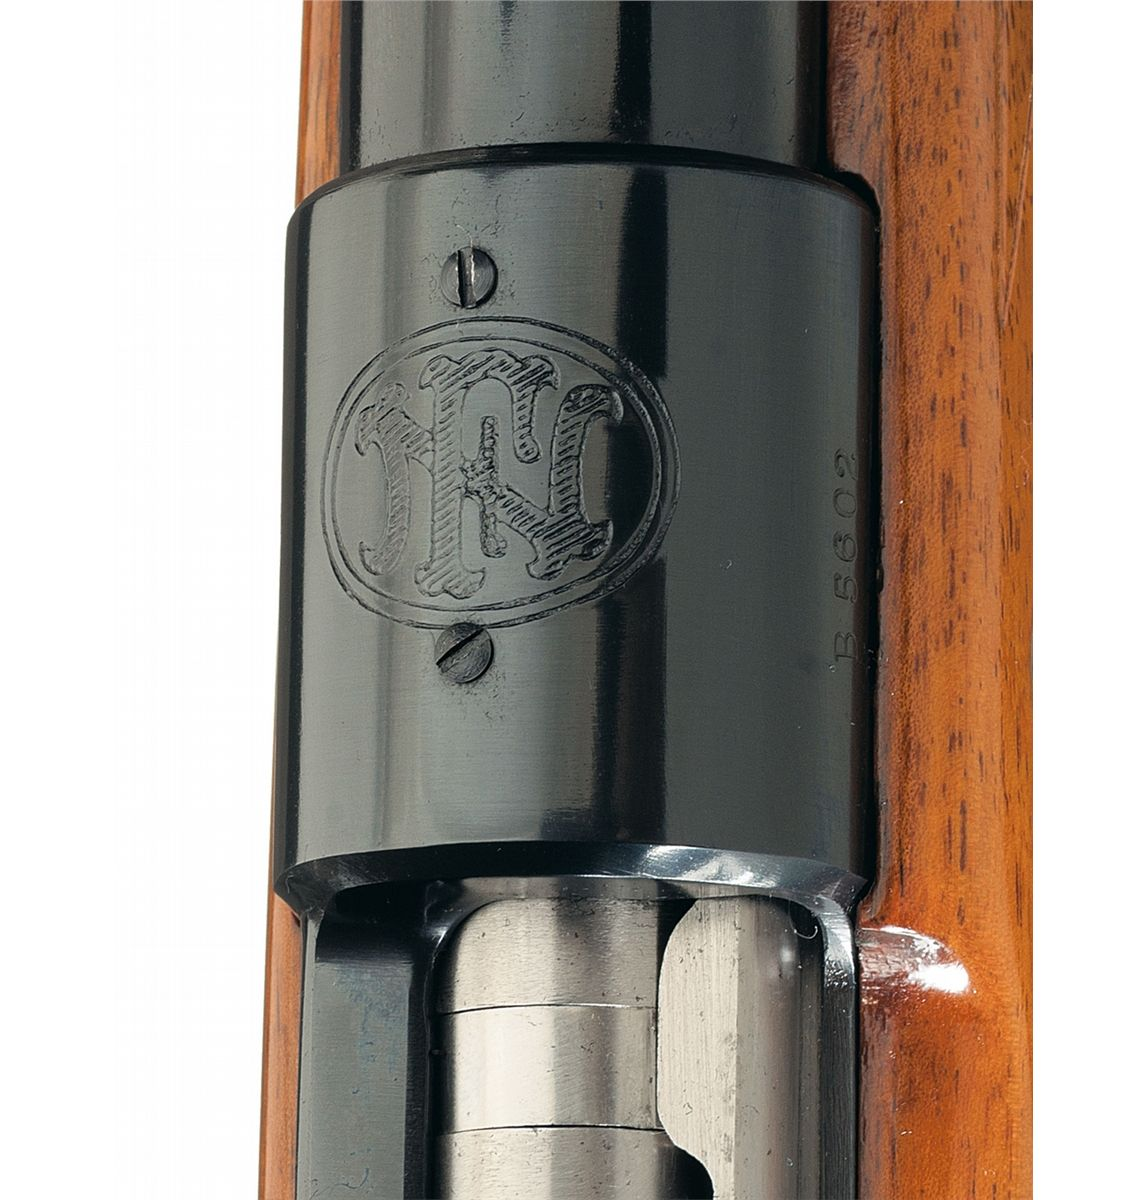 Exceptional Fabrique Nationale Mauser Continental Bolt